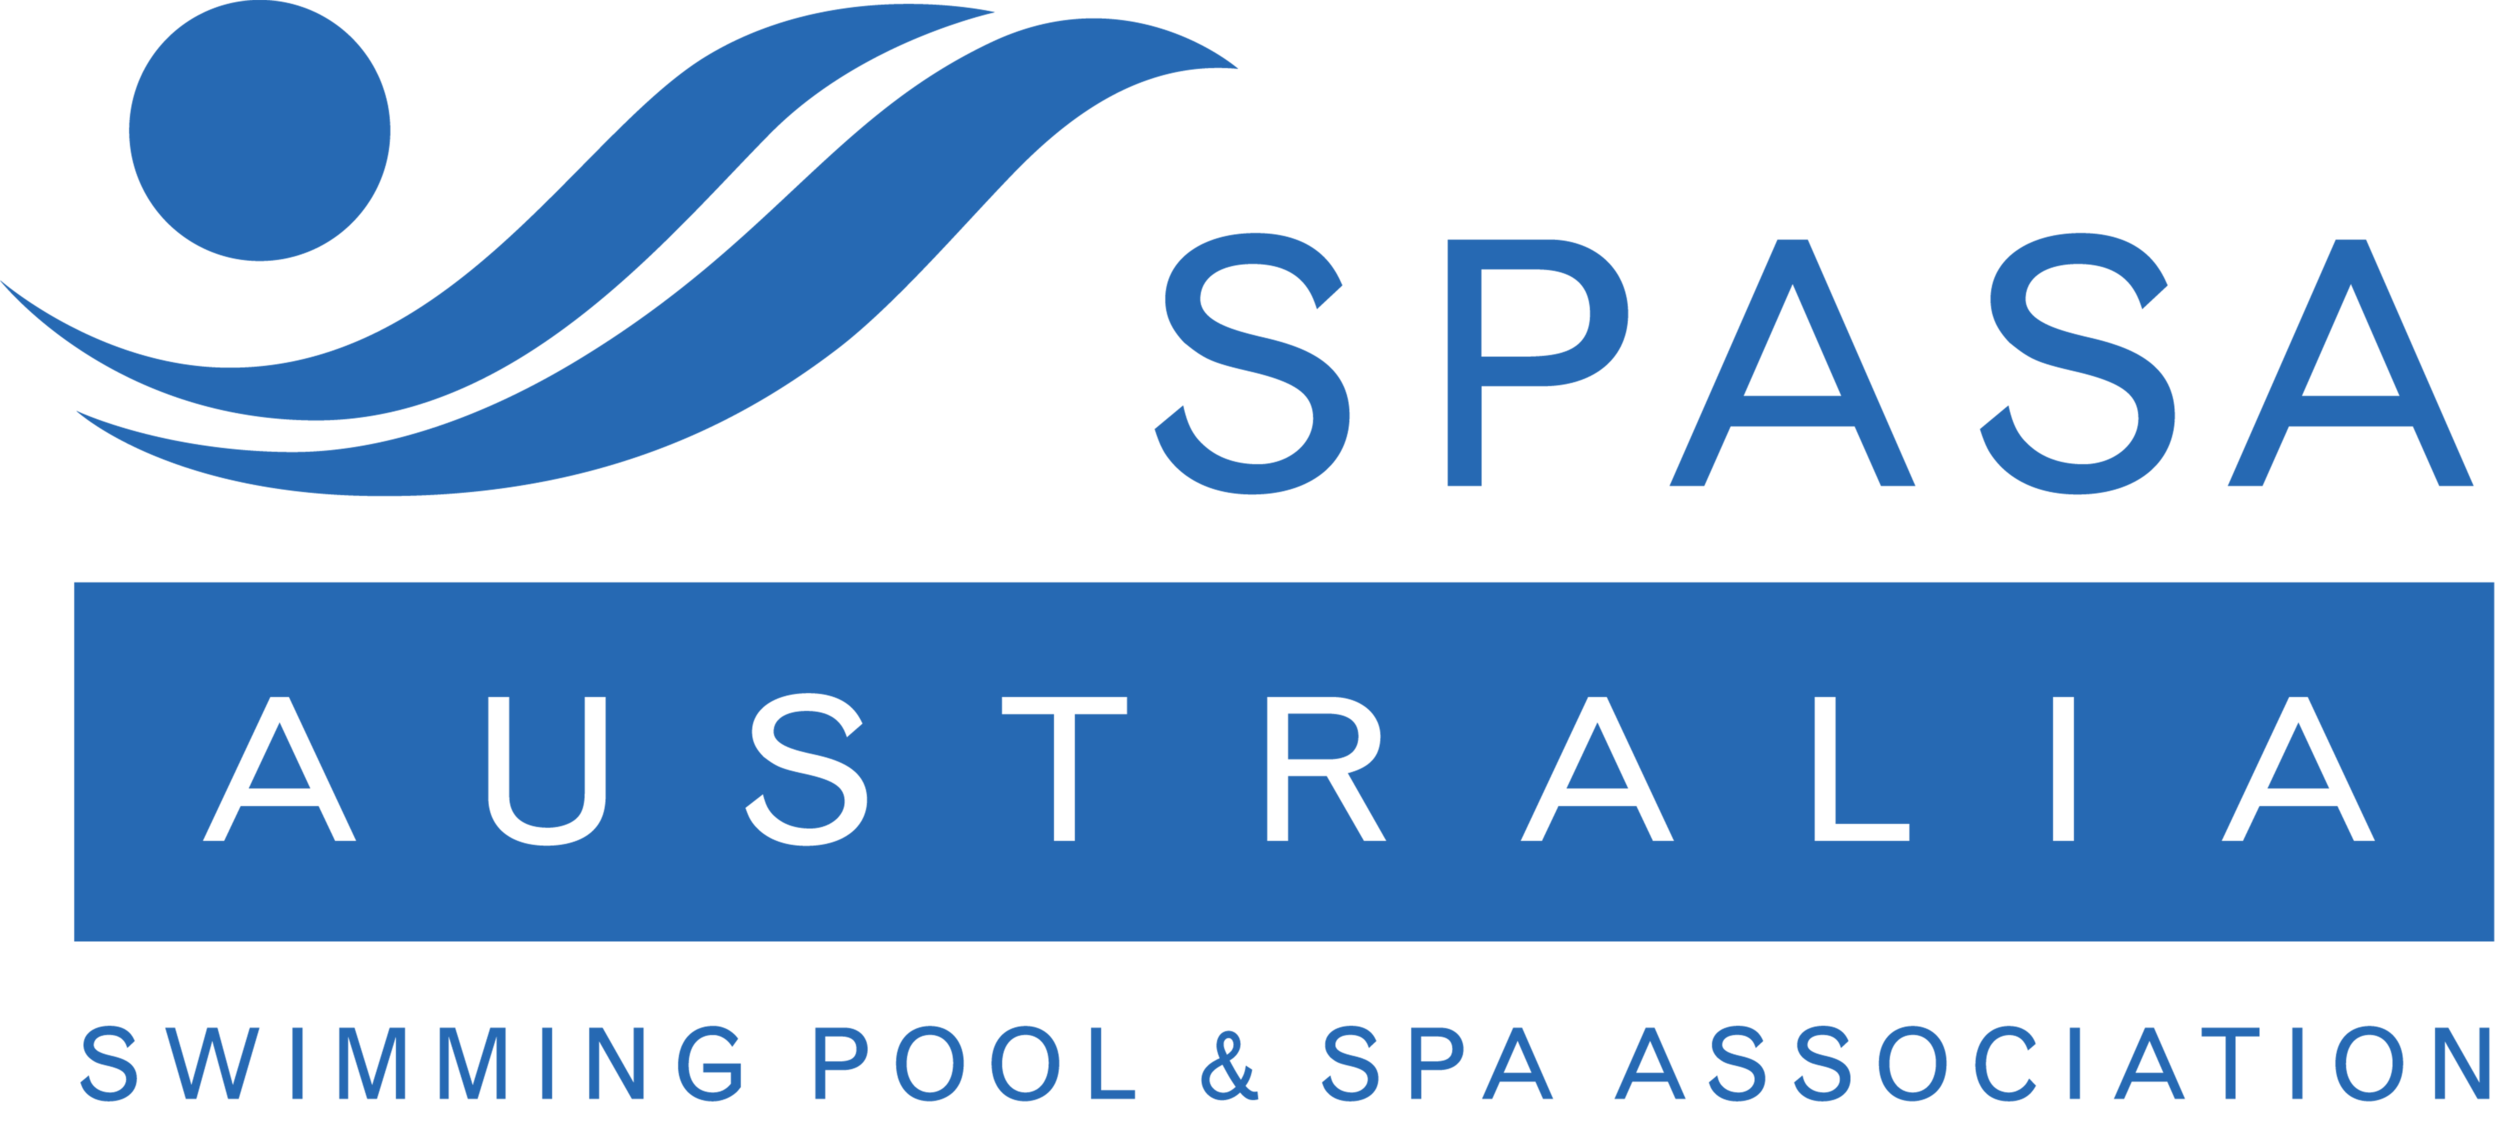 2013-SPASA_Logo_National_BLUE@3x.png